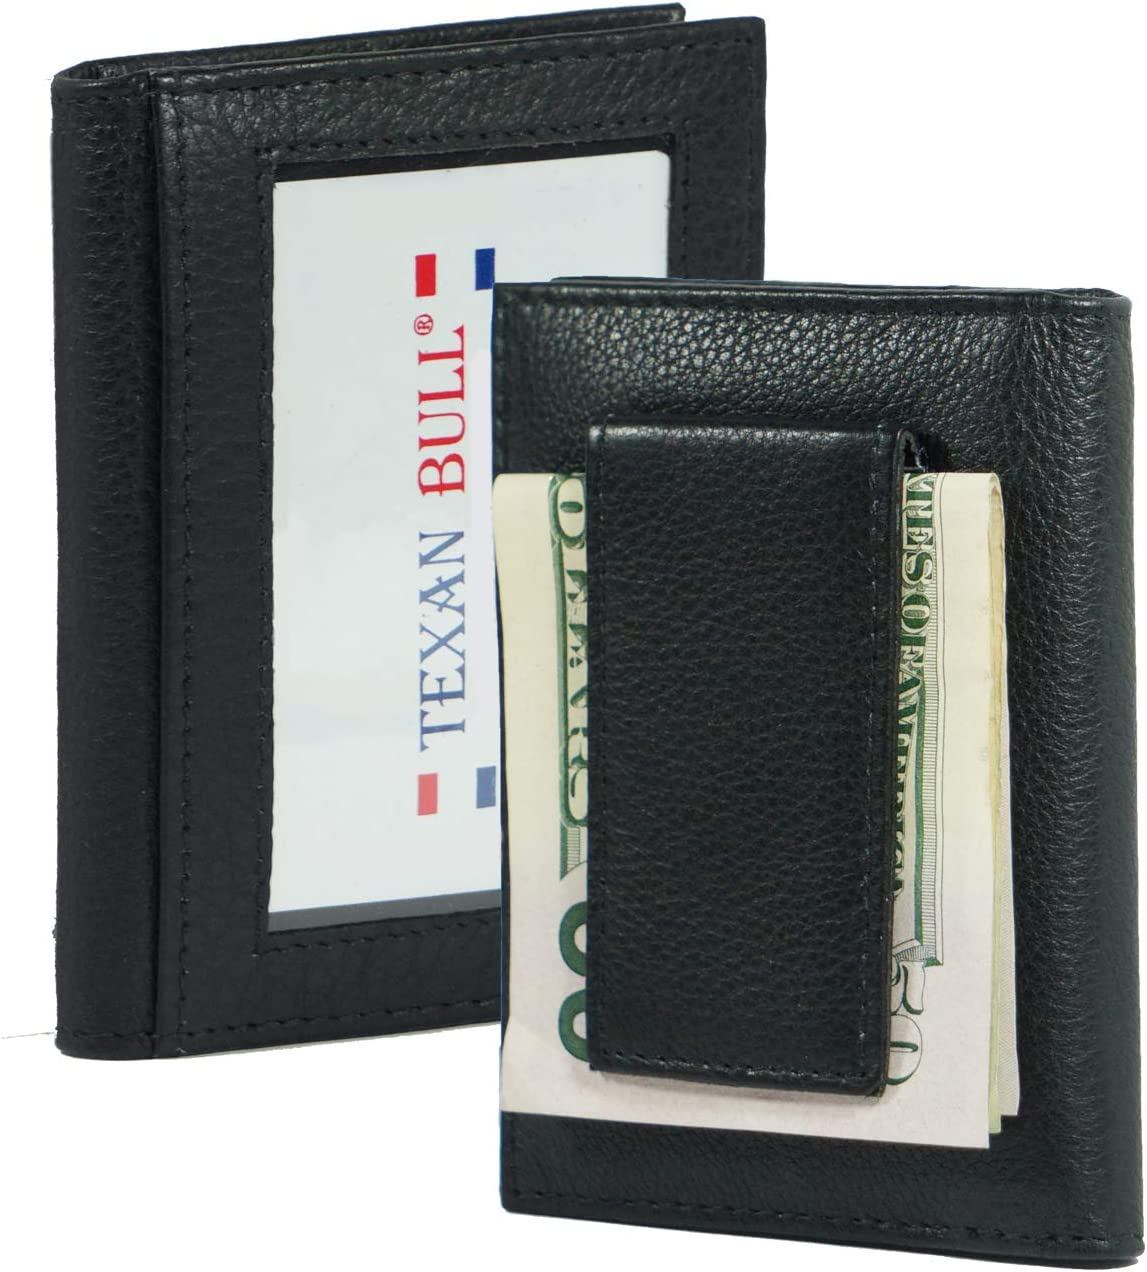 Leather Bifold Magnetic Money Clip Slim Thin Credit Card Slots-ID Holder Front Pocket Black minimalist mens wallet